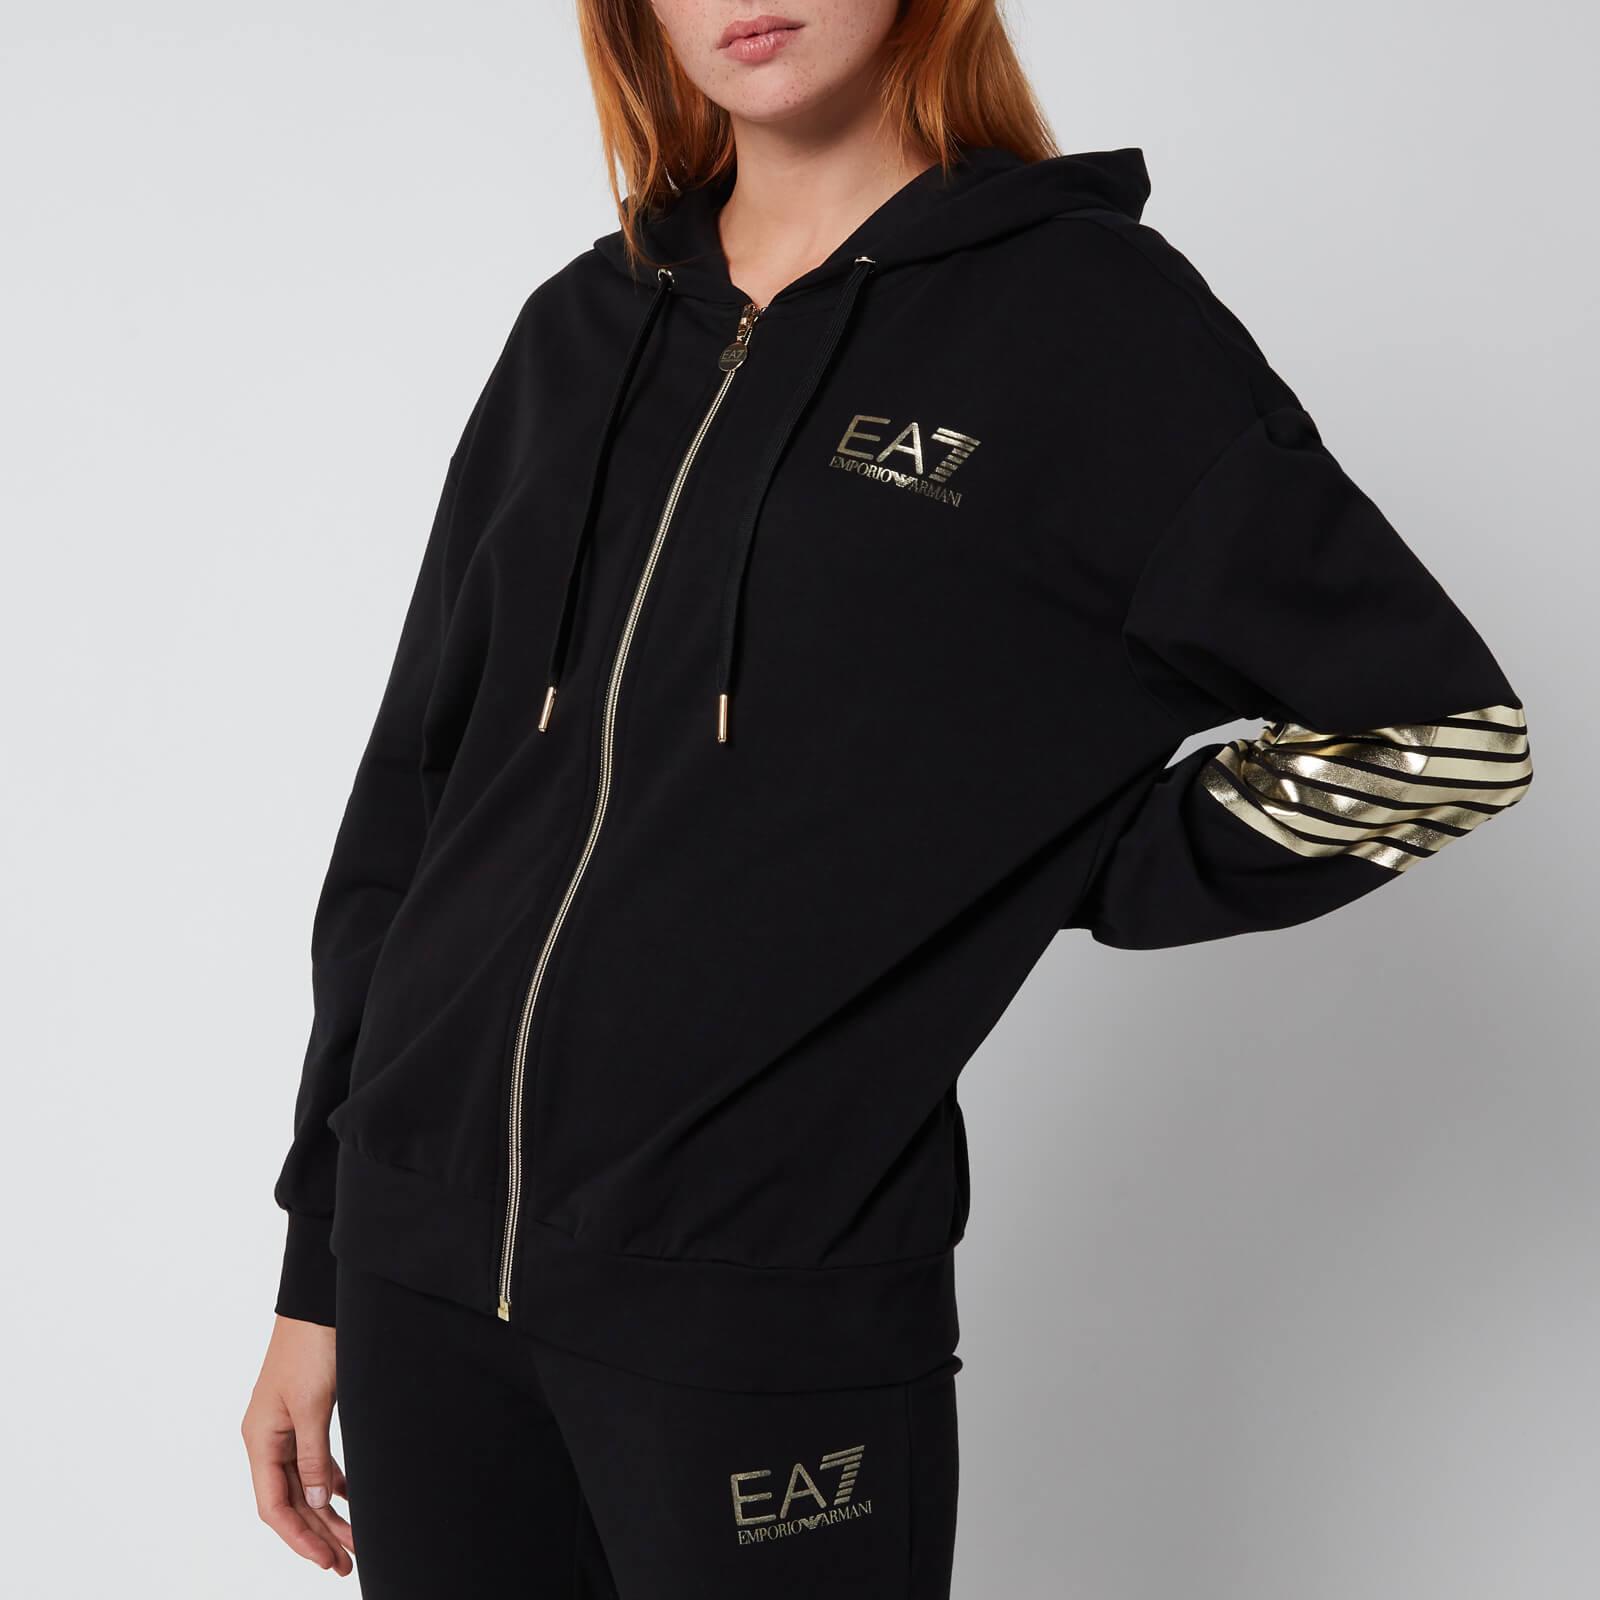 emporio armani ea7 women's train 7 lines track suit - black - xs